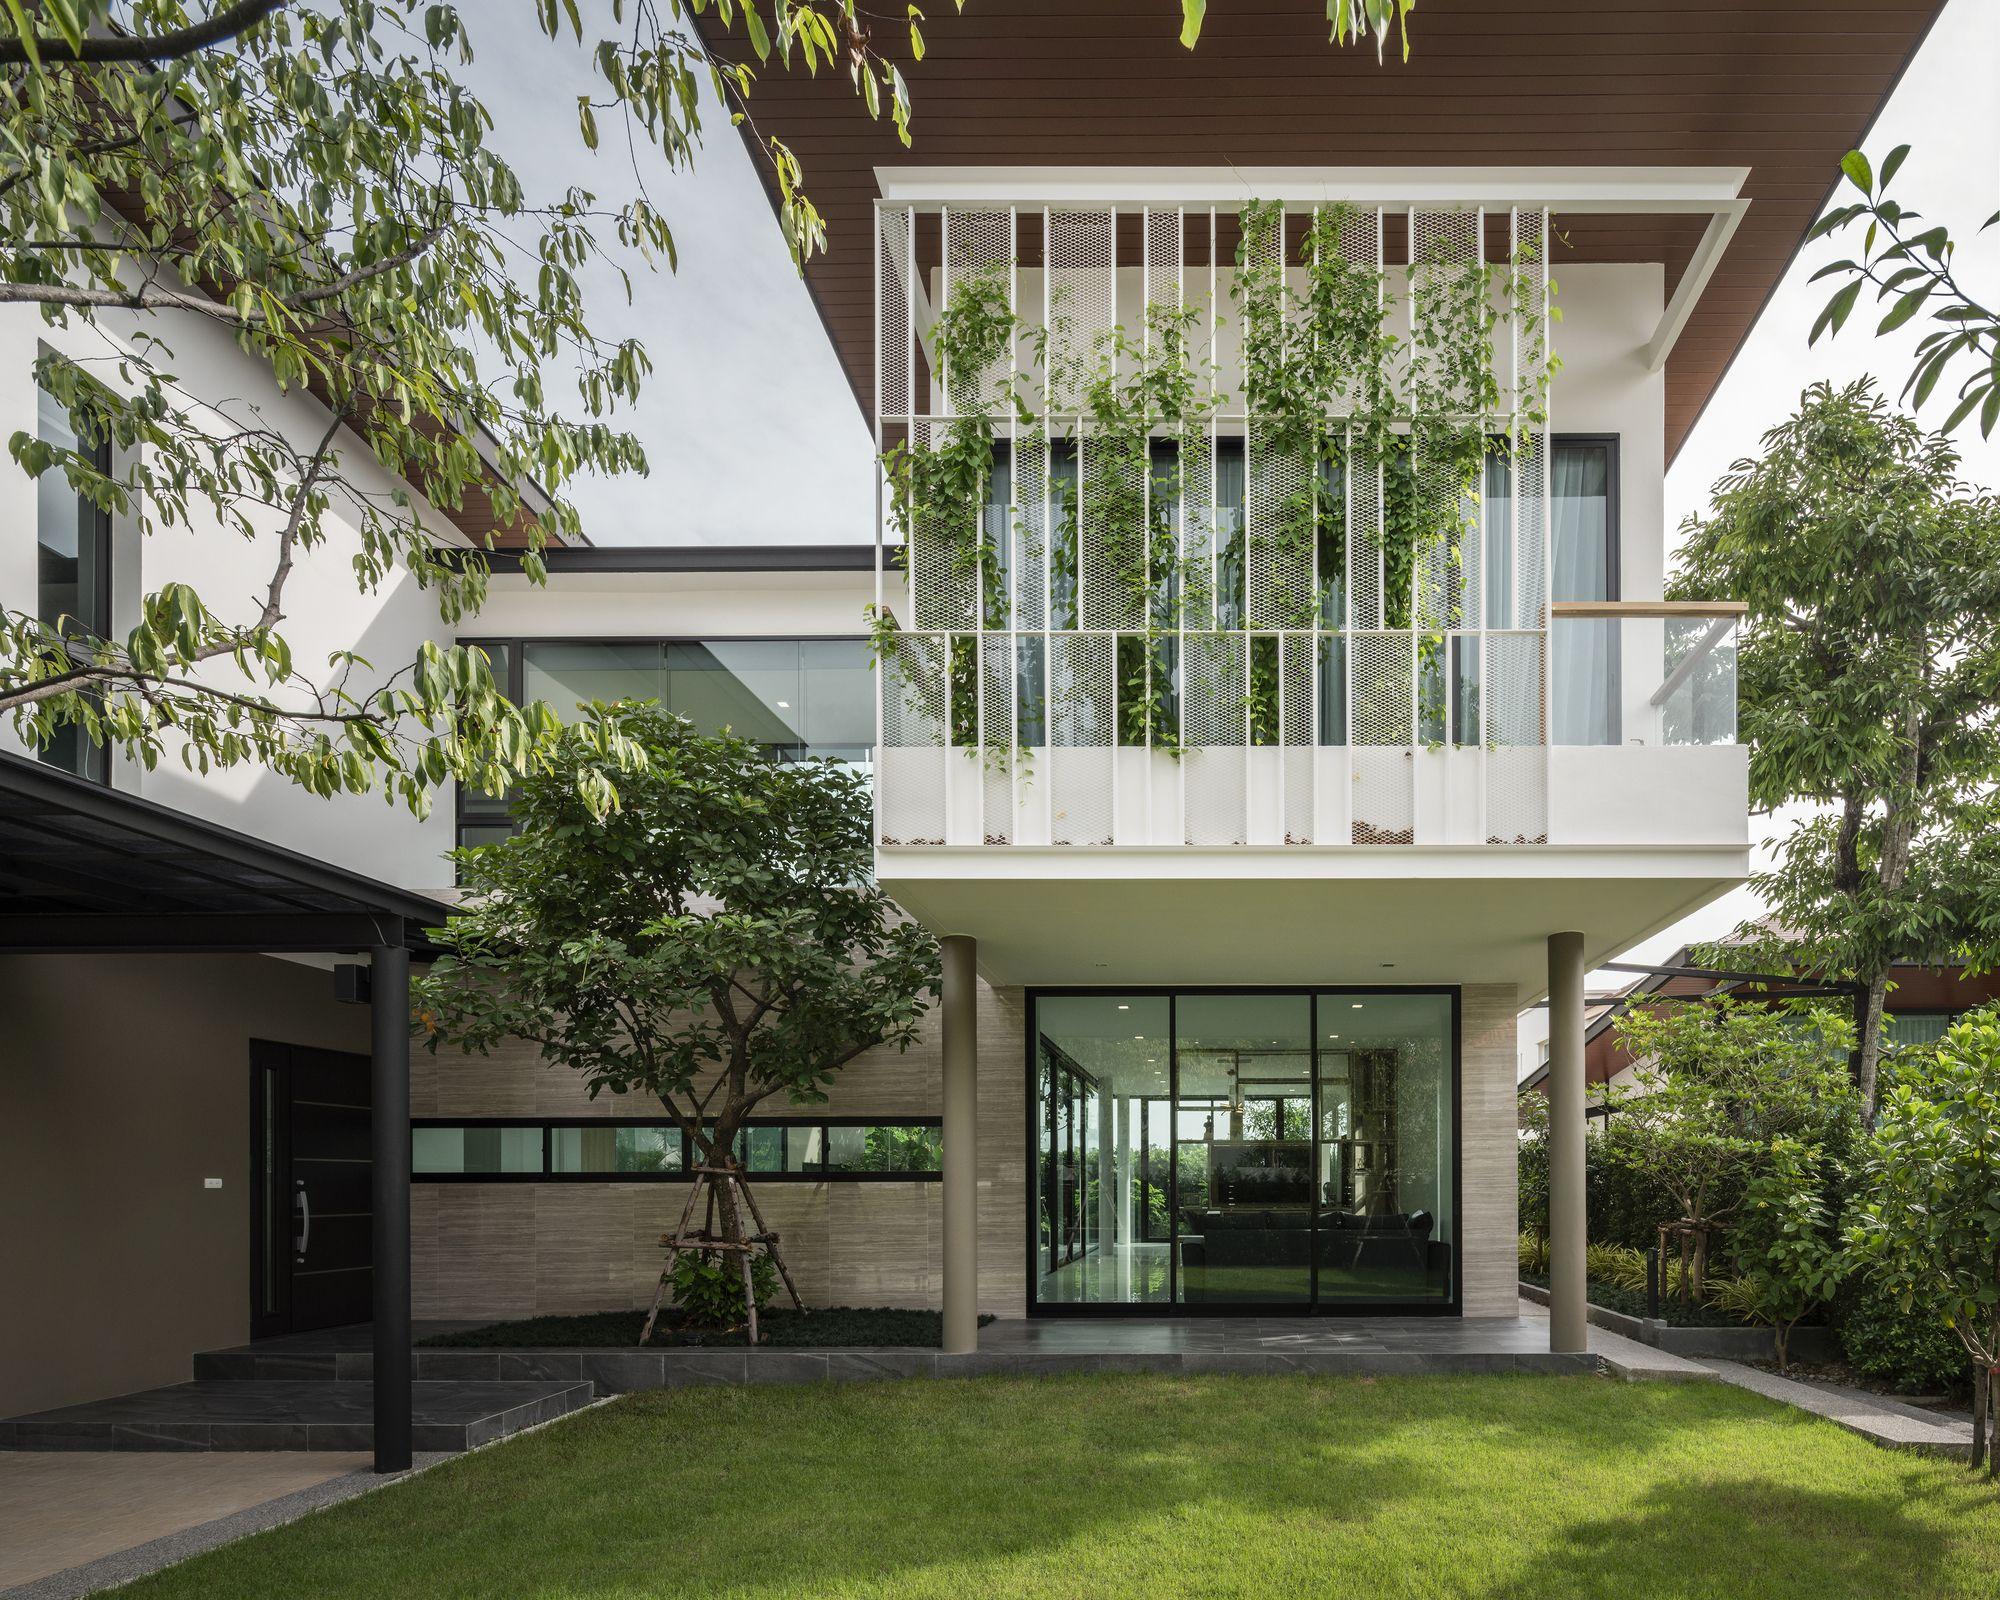 Erdgeschoss haus front design siri house  gla design studio  otthon  pinterest  siri